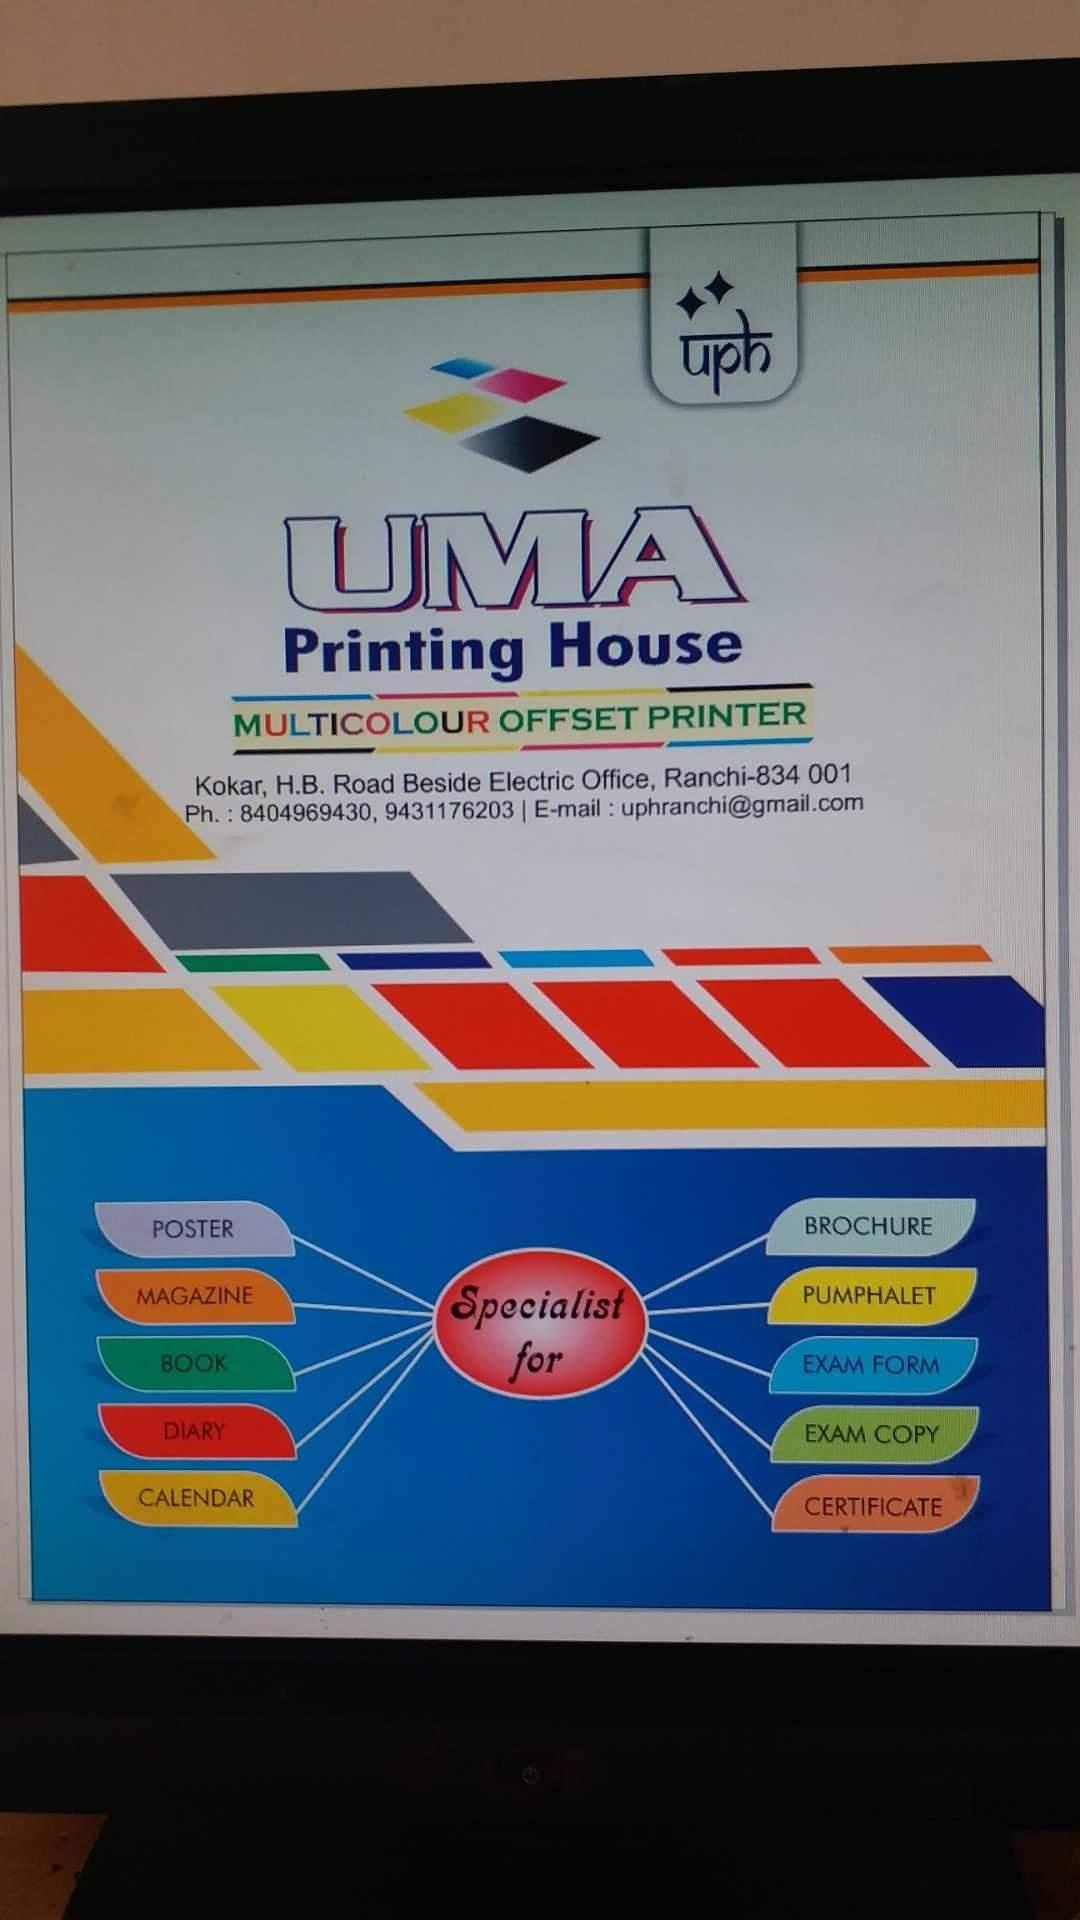 Uma Printing House, Kokar - Printing Press In Ranchi - Justdial_Calendar Printing In Ranchi